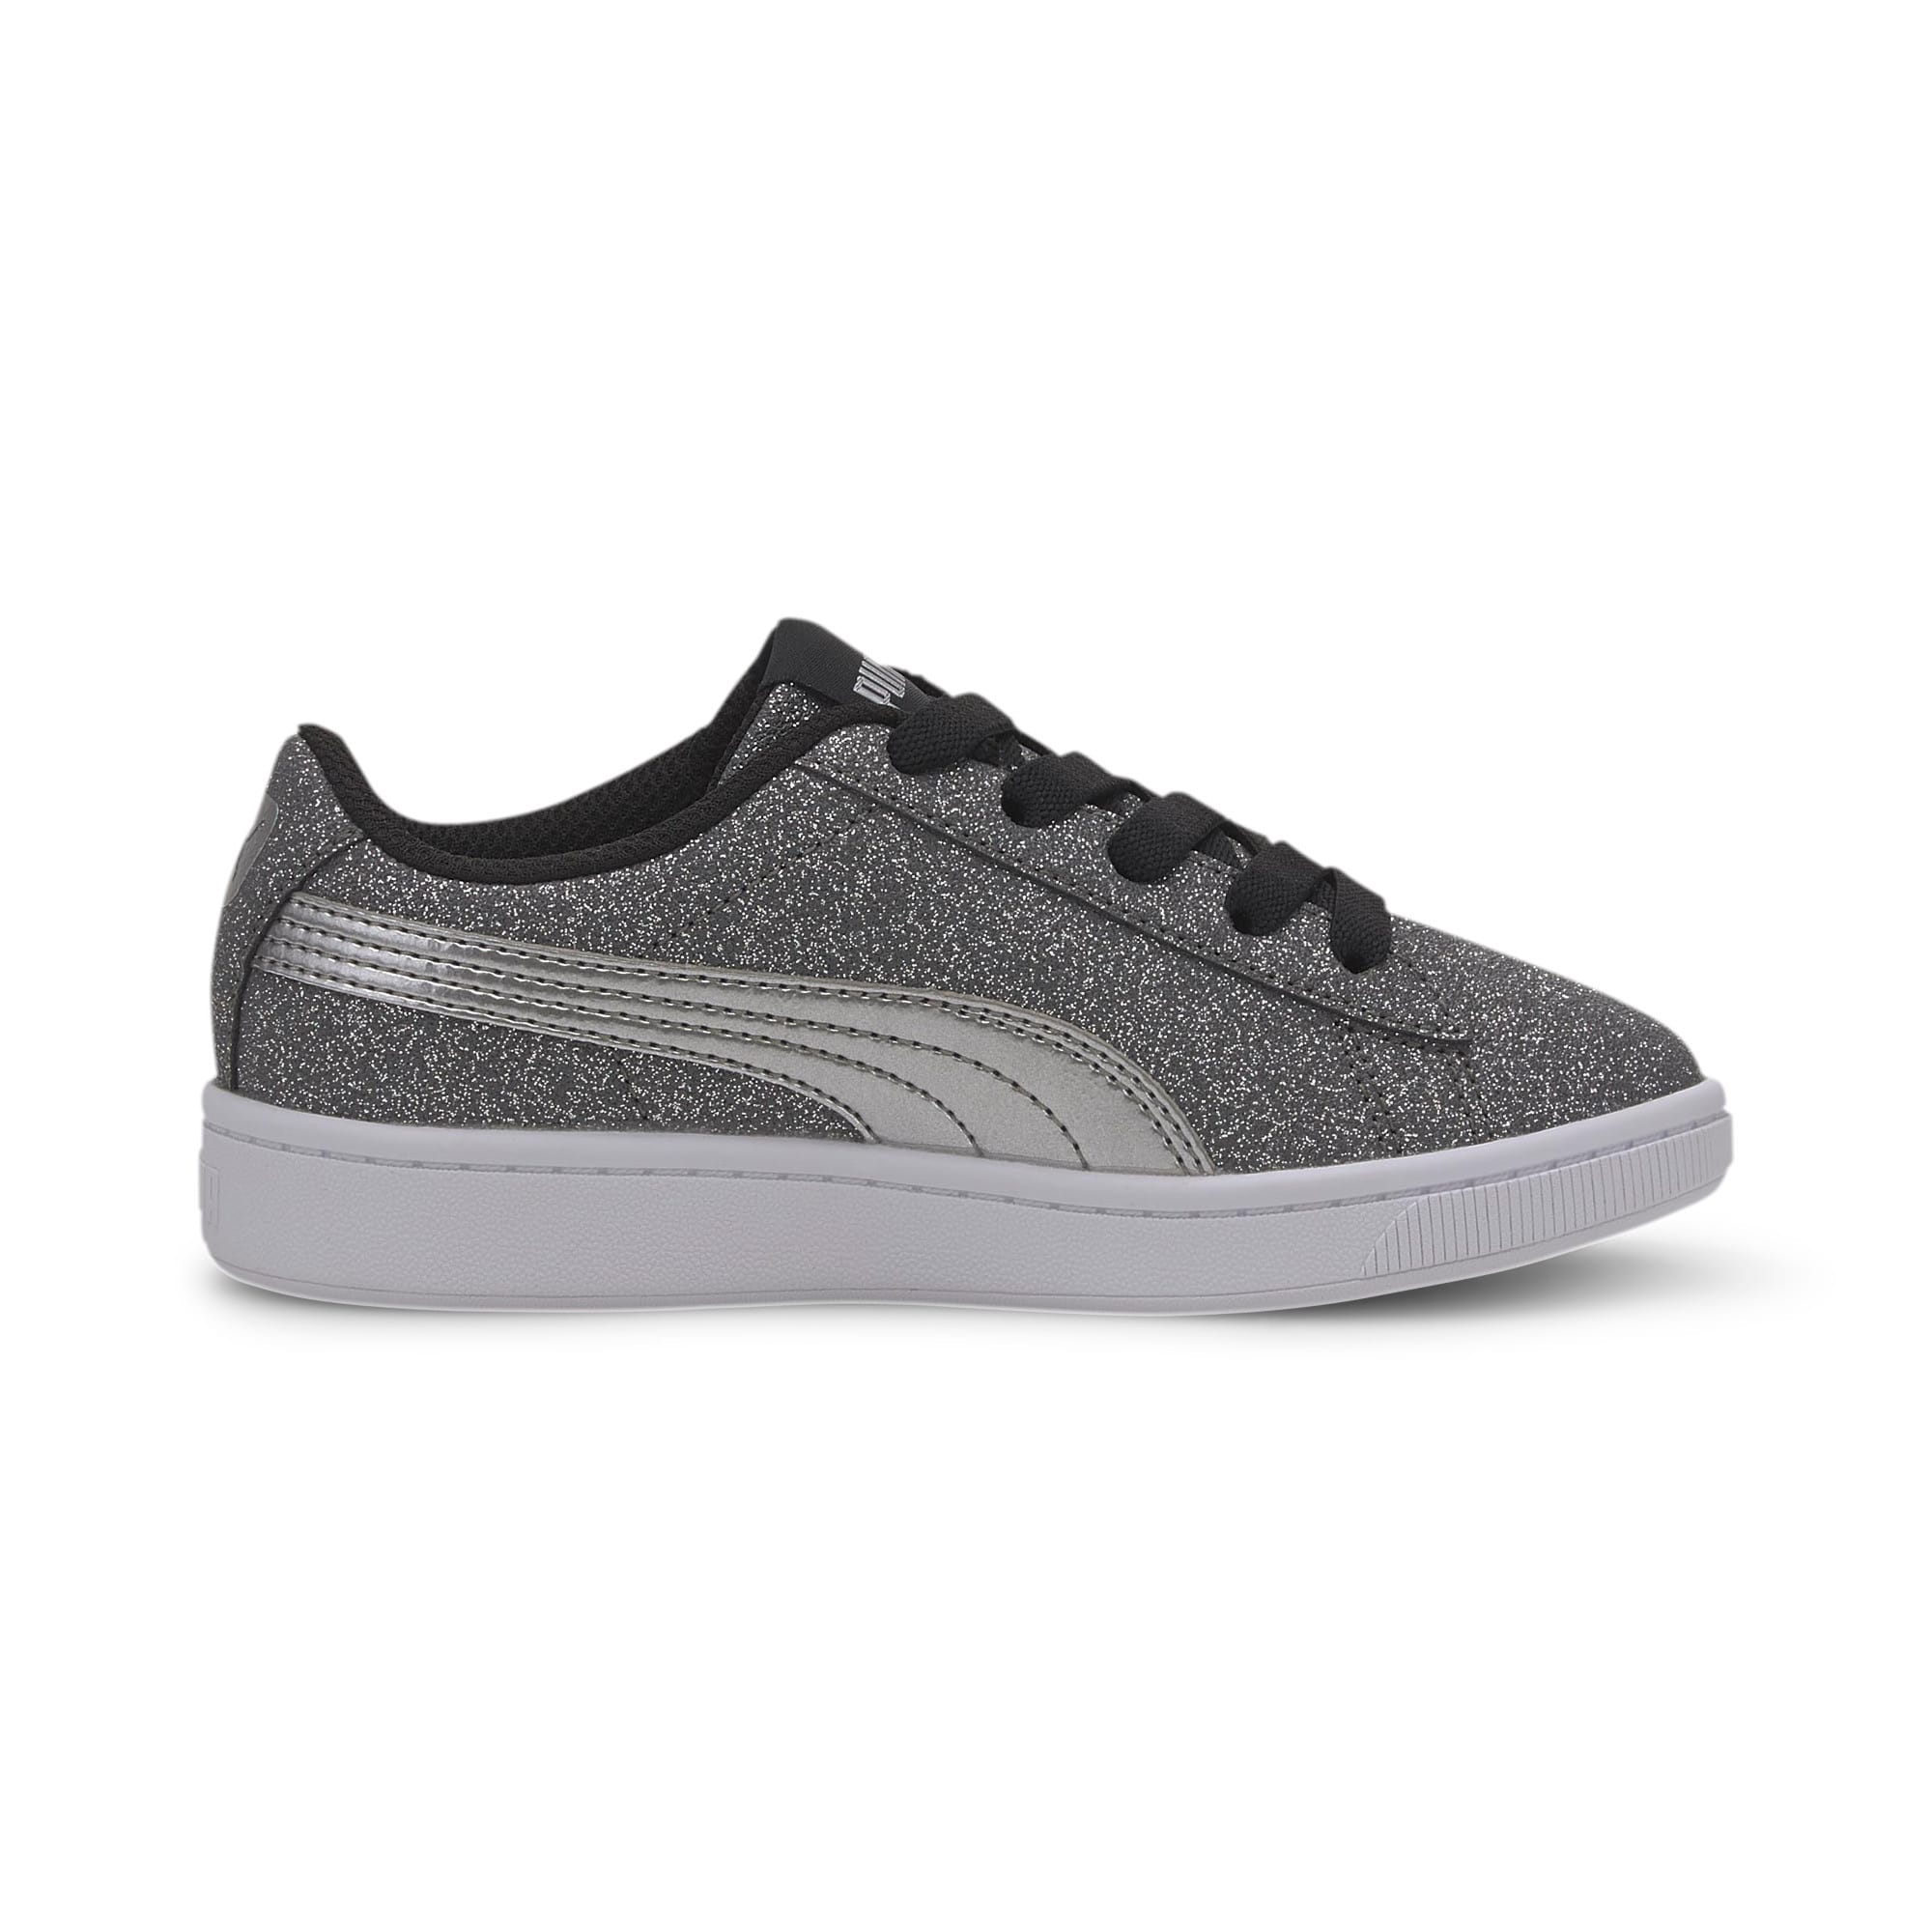 Thumbnail 5 of PUMA Vikky v2 Glitz AC Sneakers PS, Puma Black-Silver-White, medium